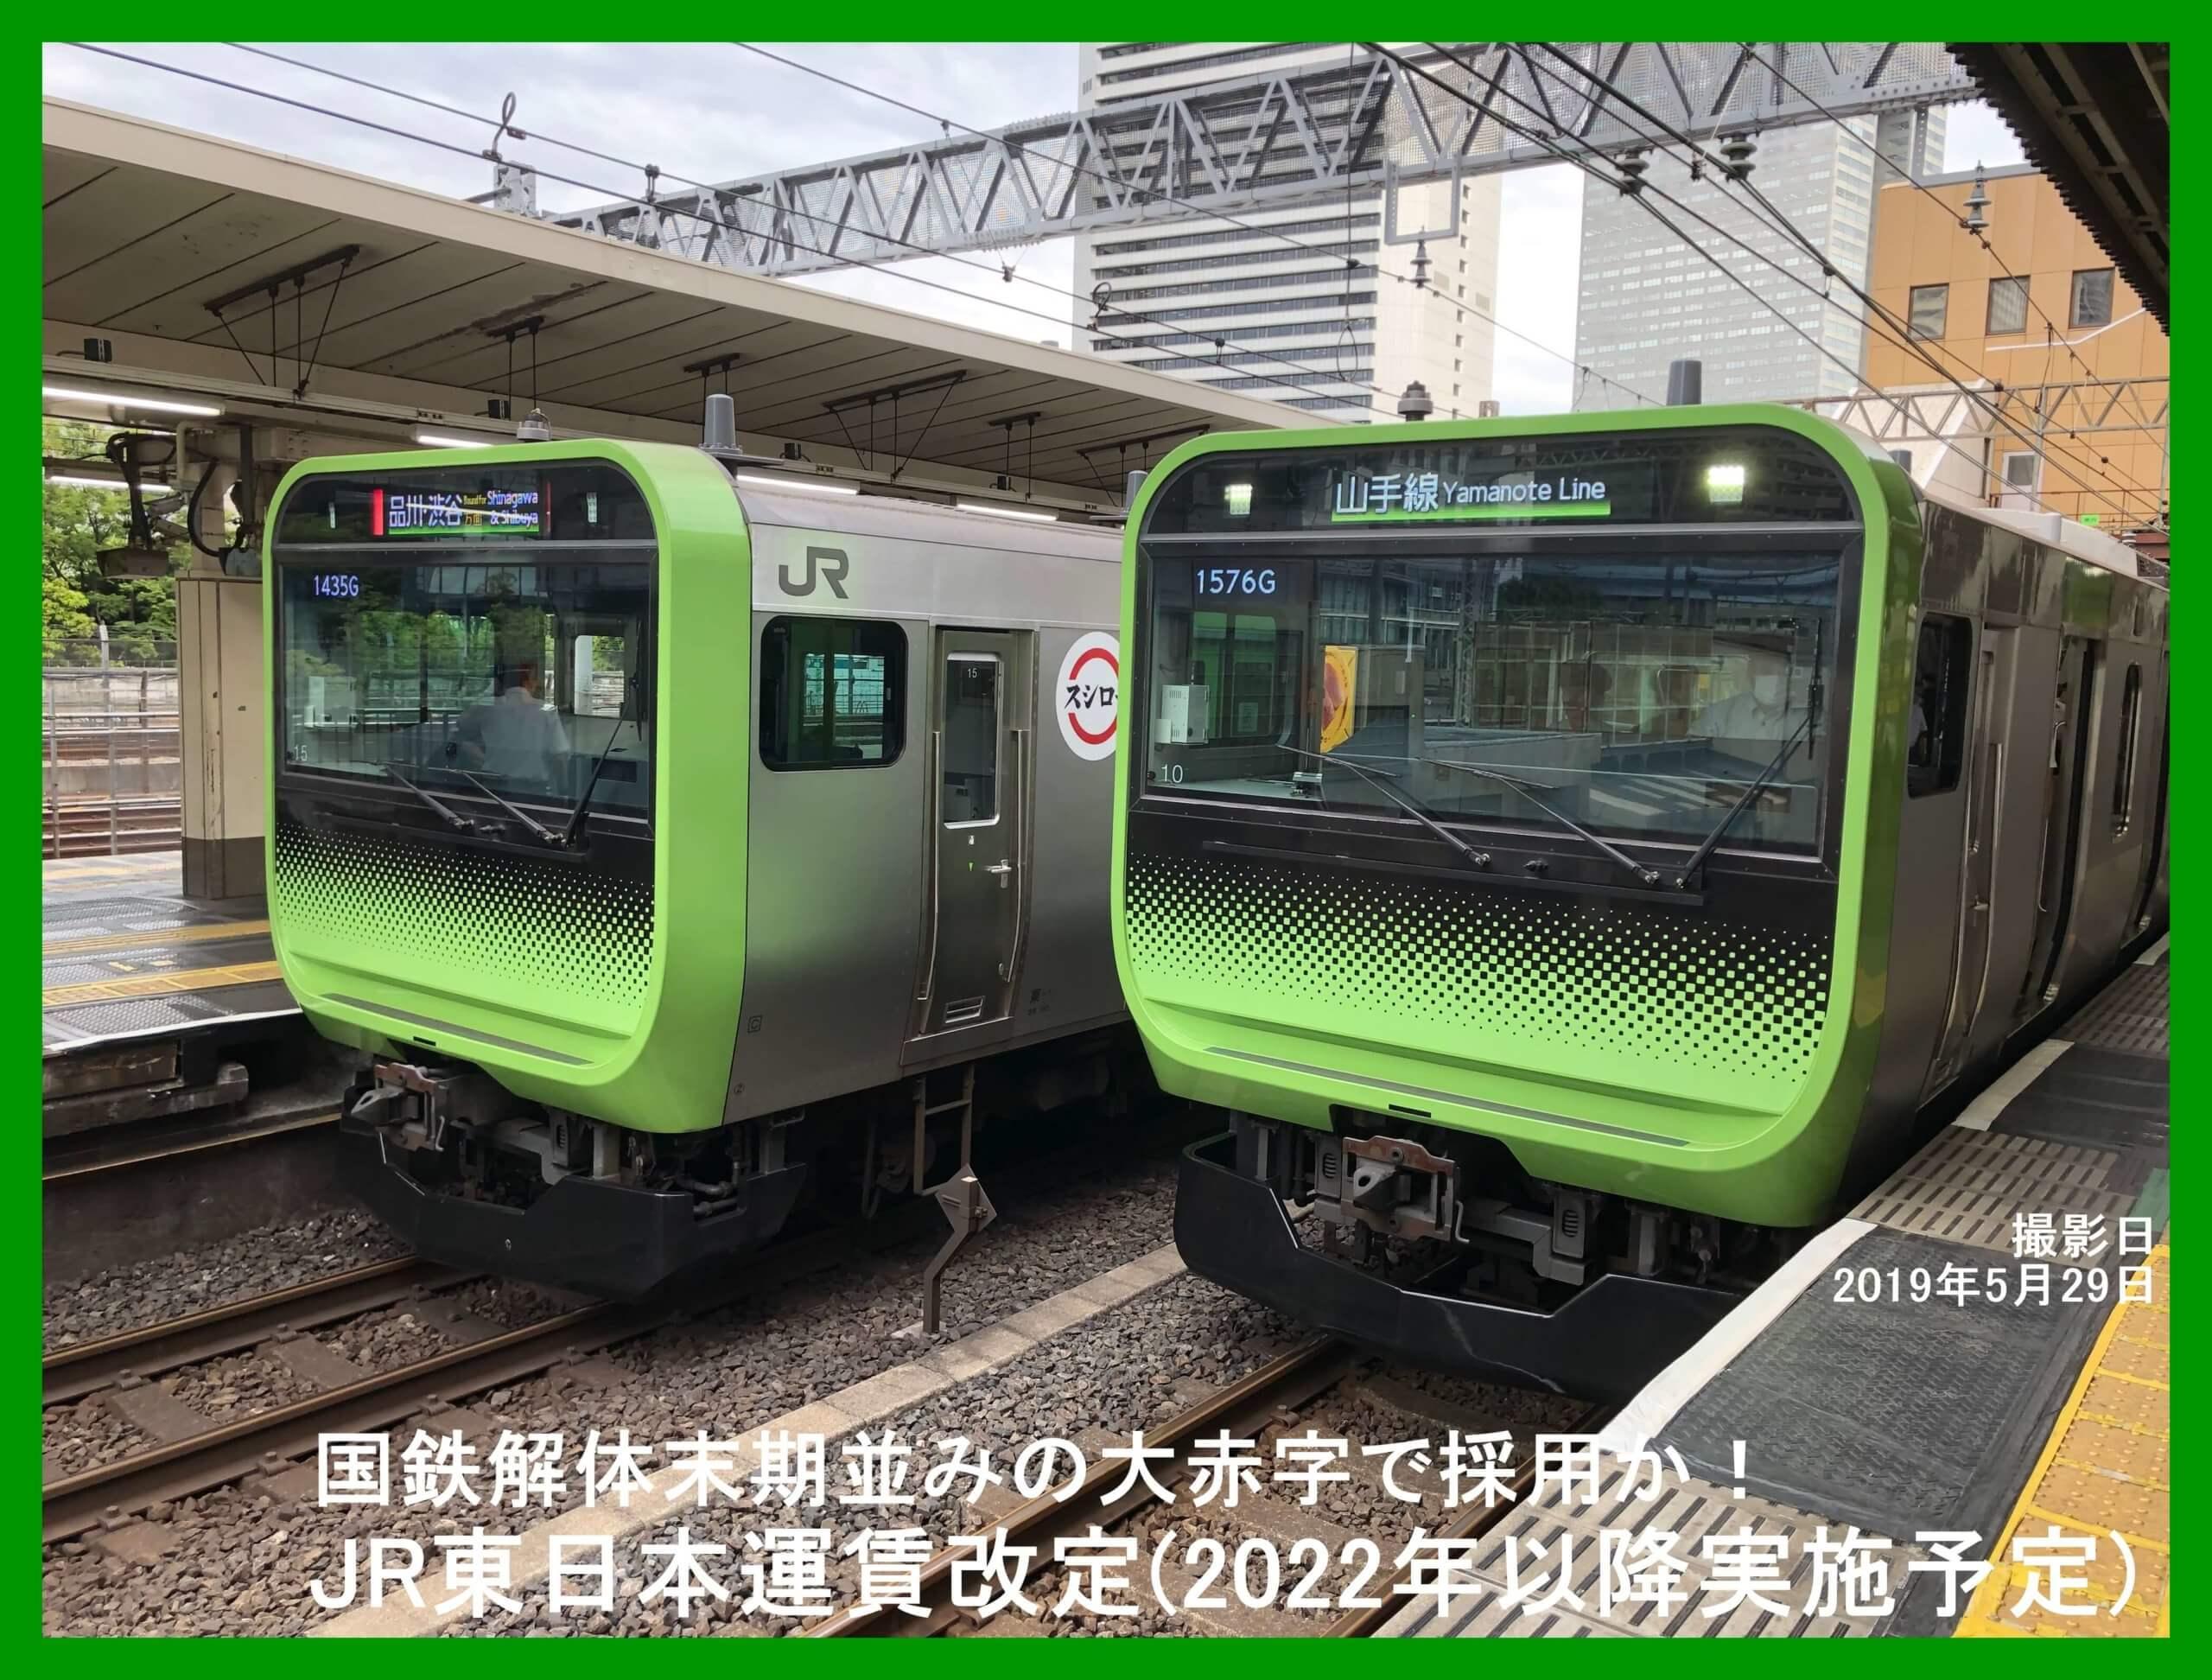 国鉄解体末期並みの大赤字で時間帯別運賃採用か! JR東日本運賃改定予測(2022年以降予定)